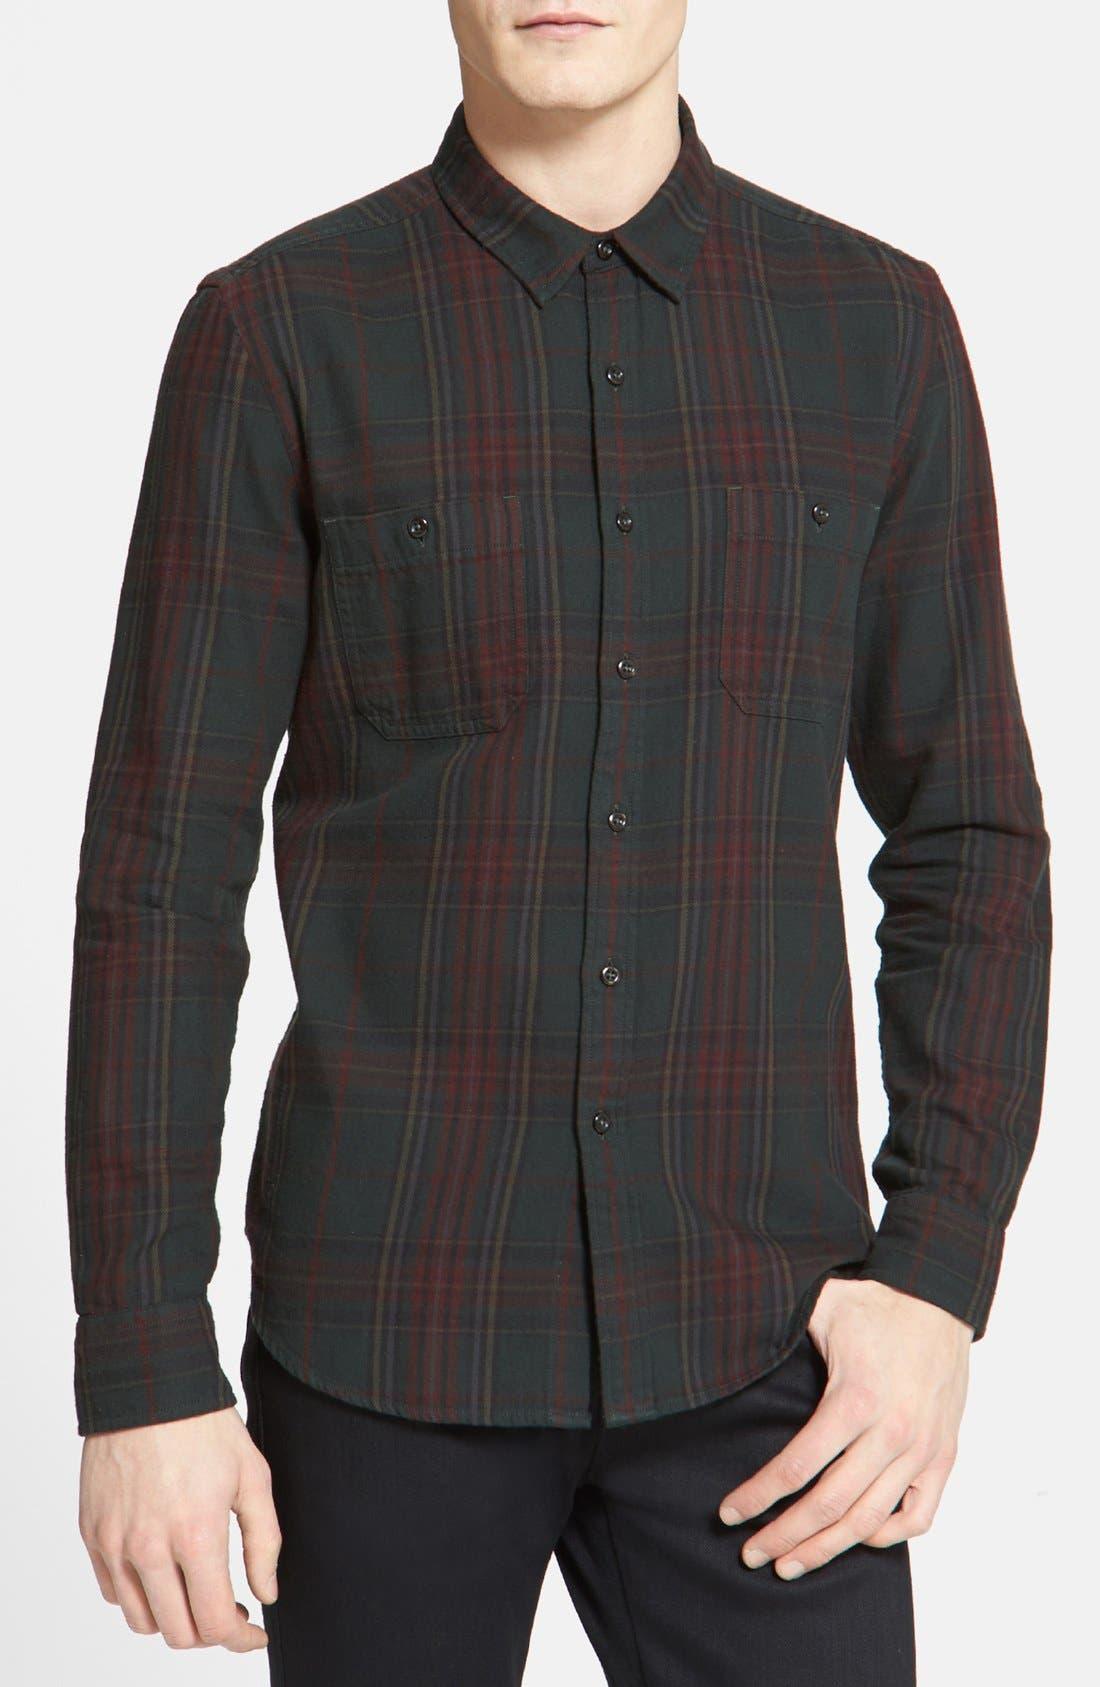 Alternate Image 1 Selected - Topman Classic Fit Tartan Plaid Flannel Shirt